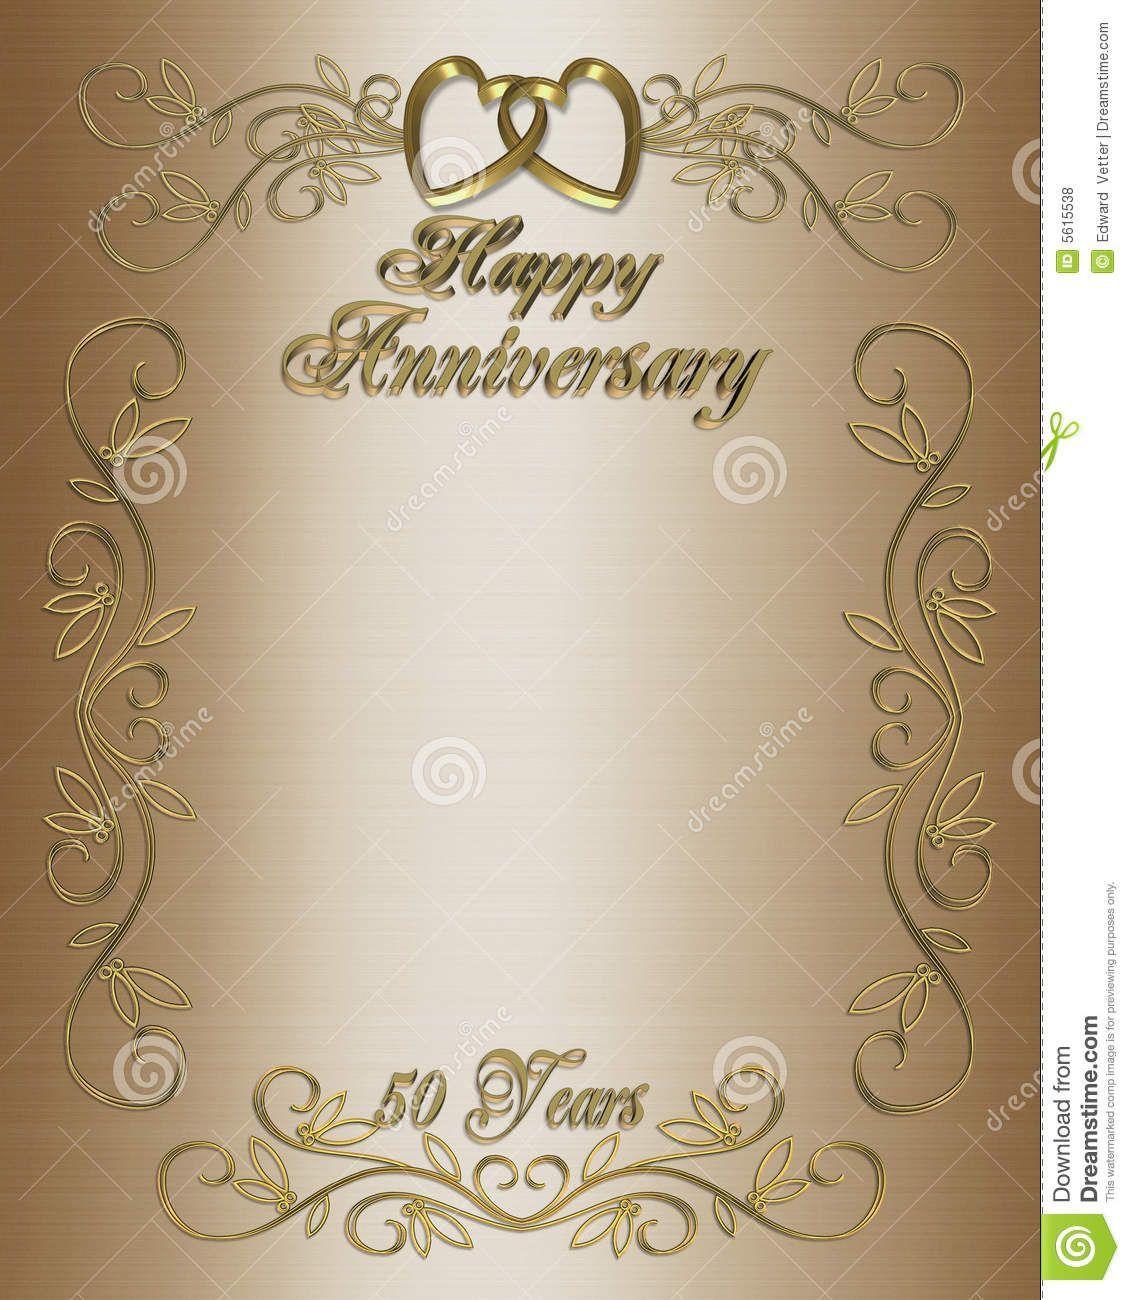 007 Stupendou 50th Anniversary Invitation Template Free High Resolution  Download Golden WeddingFull